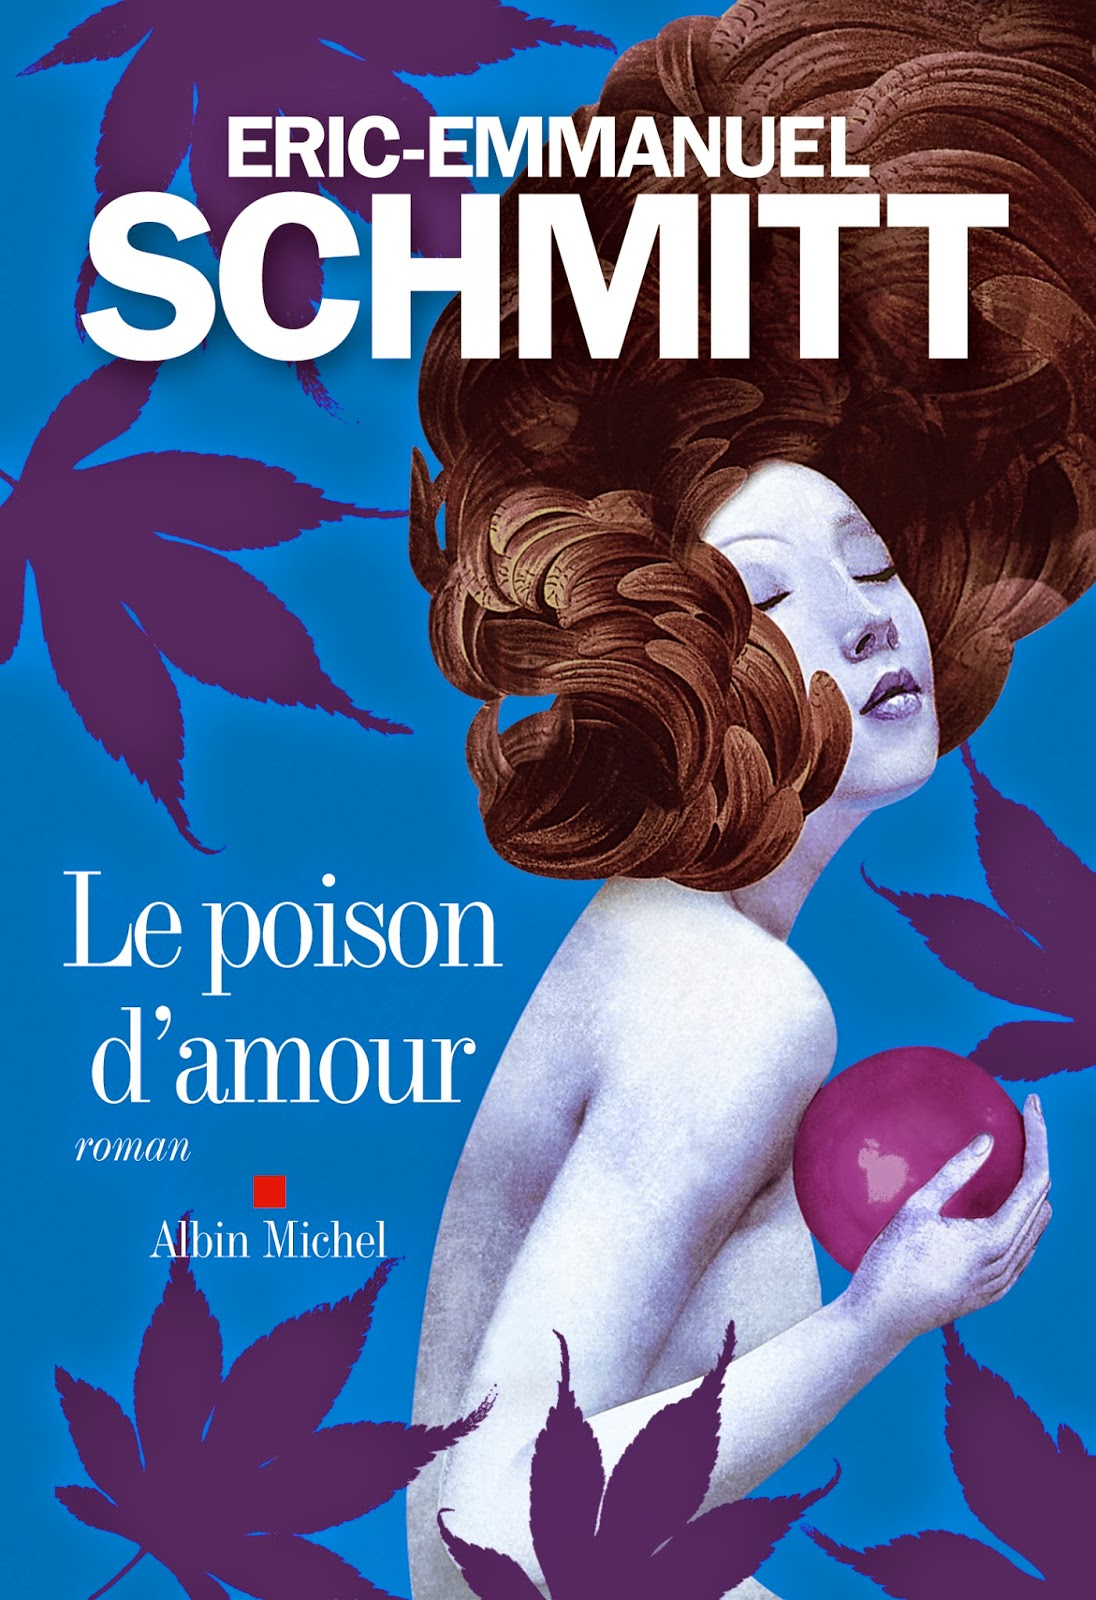 http://antredeslivres.blogspot.fr/2015/02/le-poison-damour.html